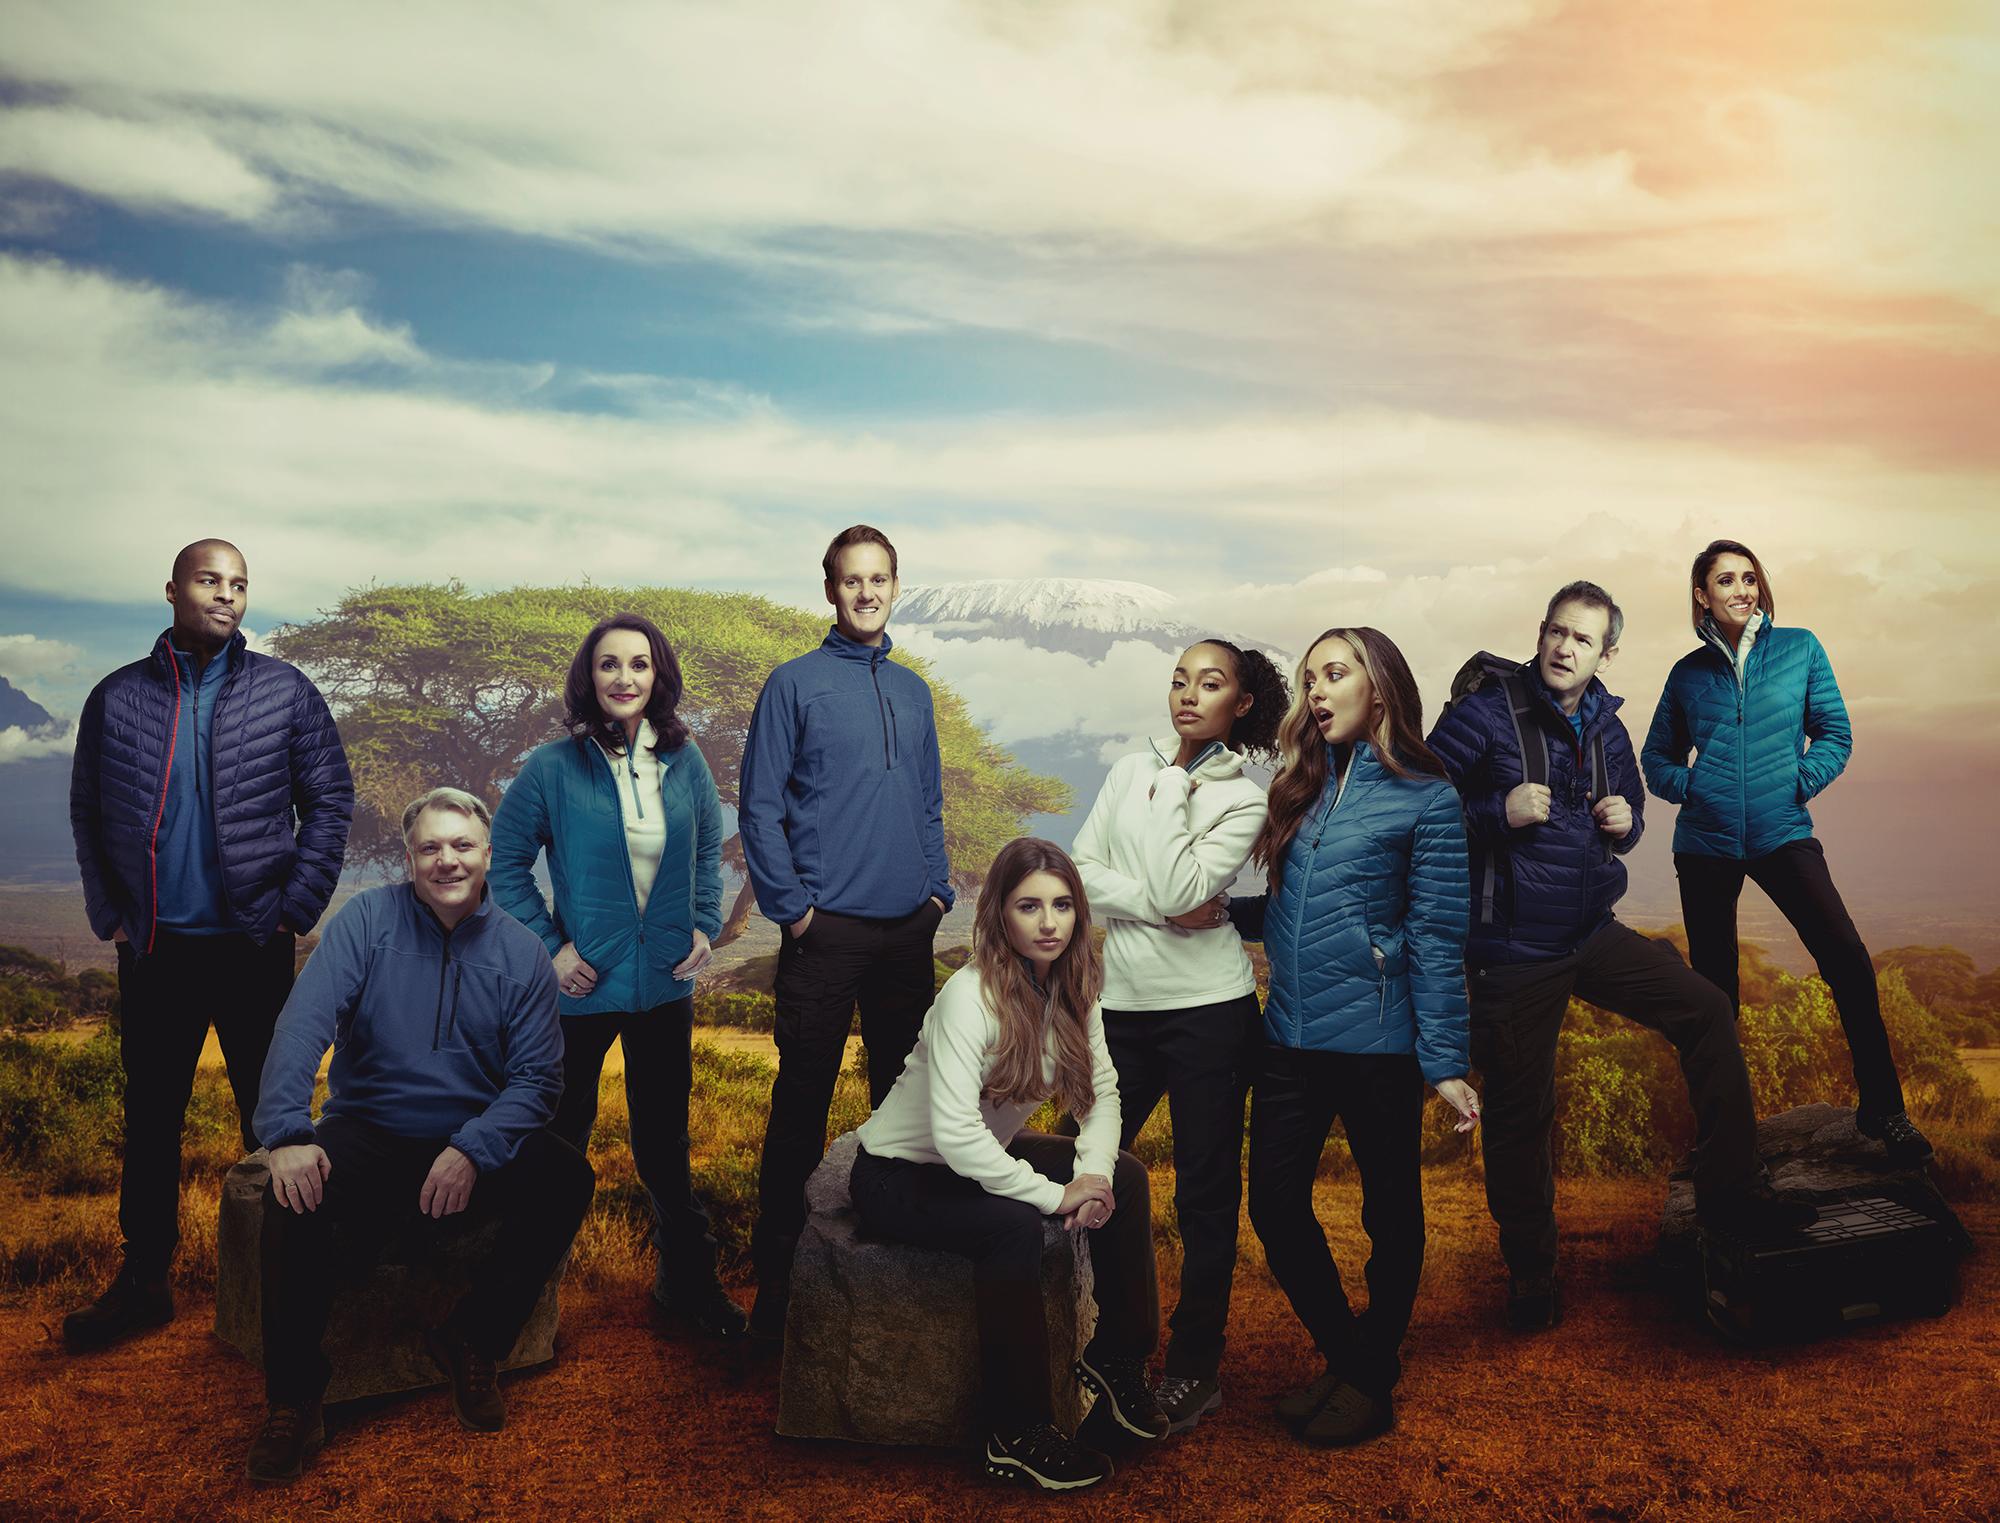 Comic Relief's Mount Kilimanjaro climb celebrities